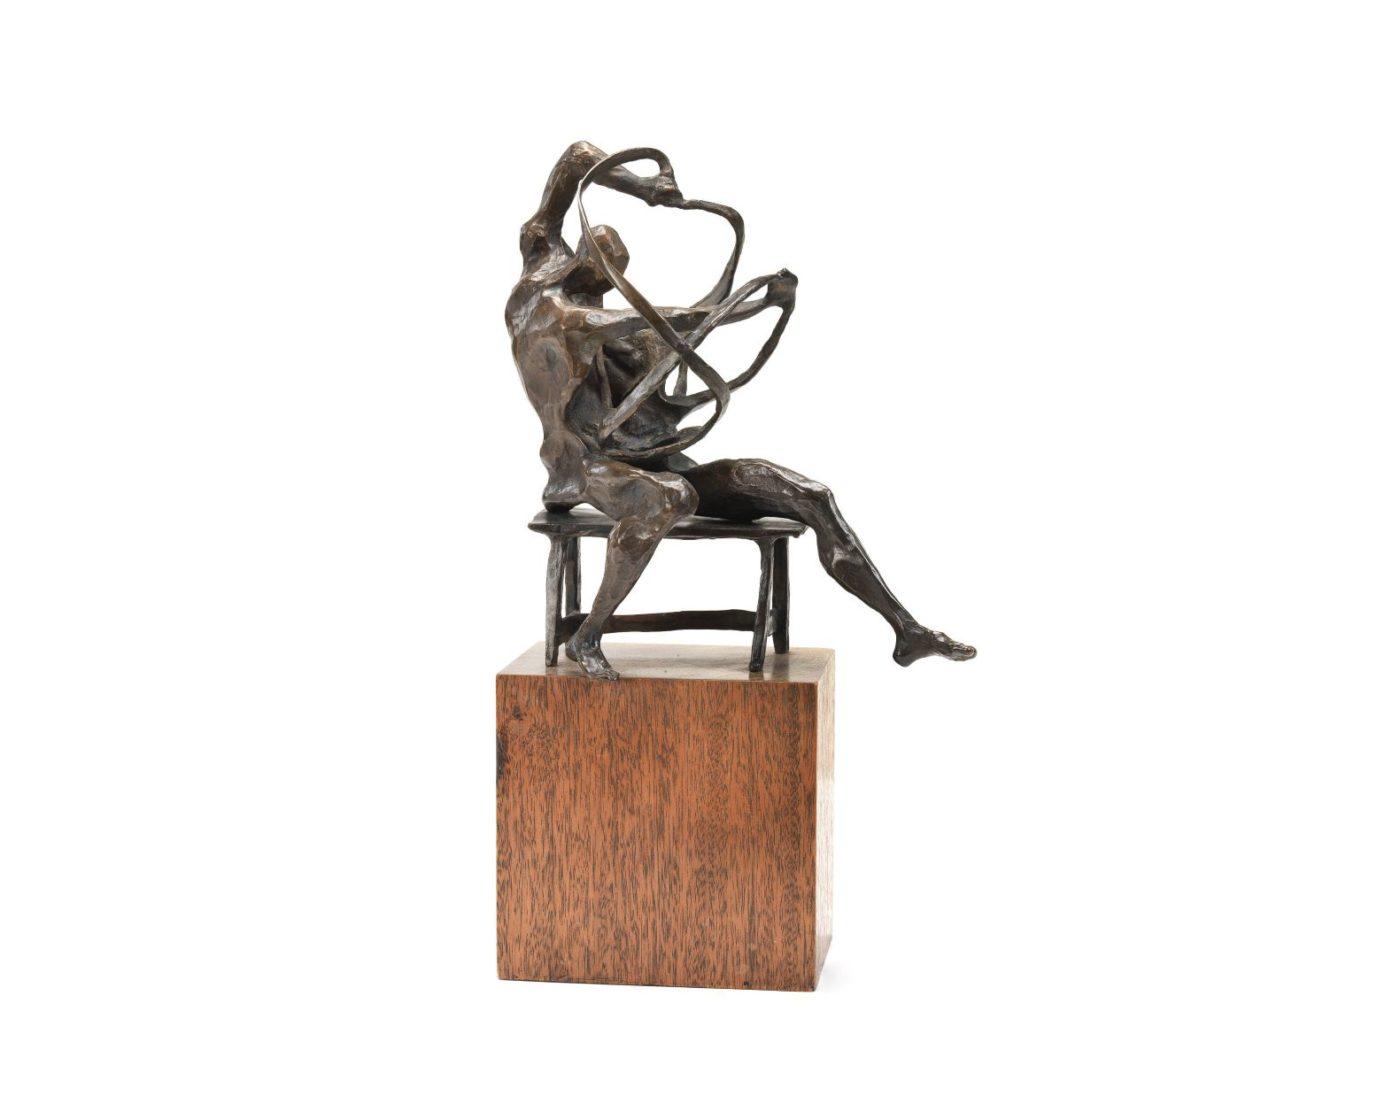 Michael Ayrton (1921-1975), Laocoön Maze Figure II